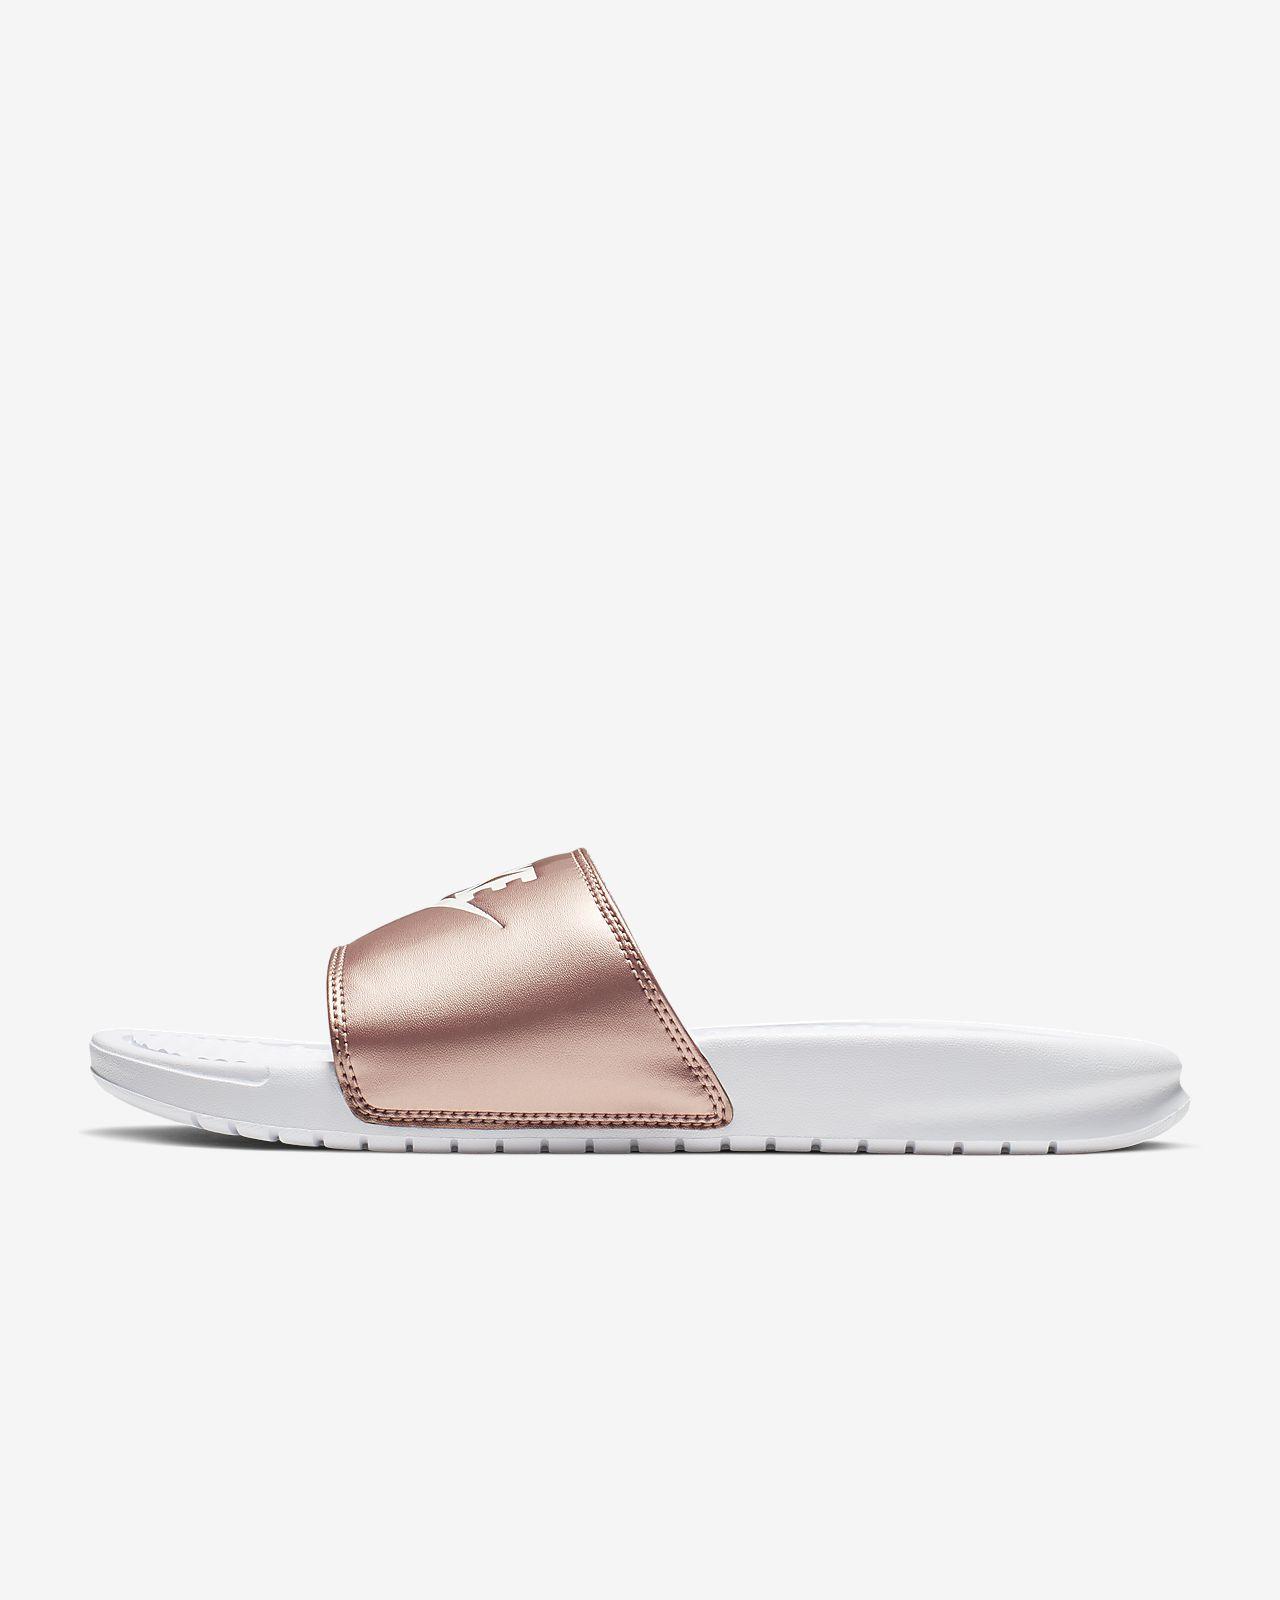 sale usa online competitive price new arrive Nike Benassi Women's Slide